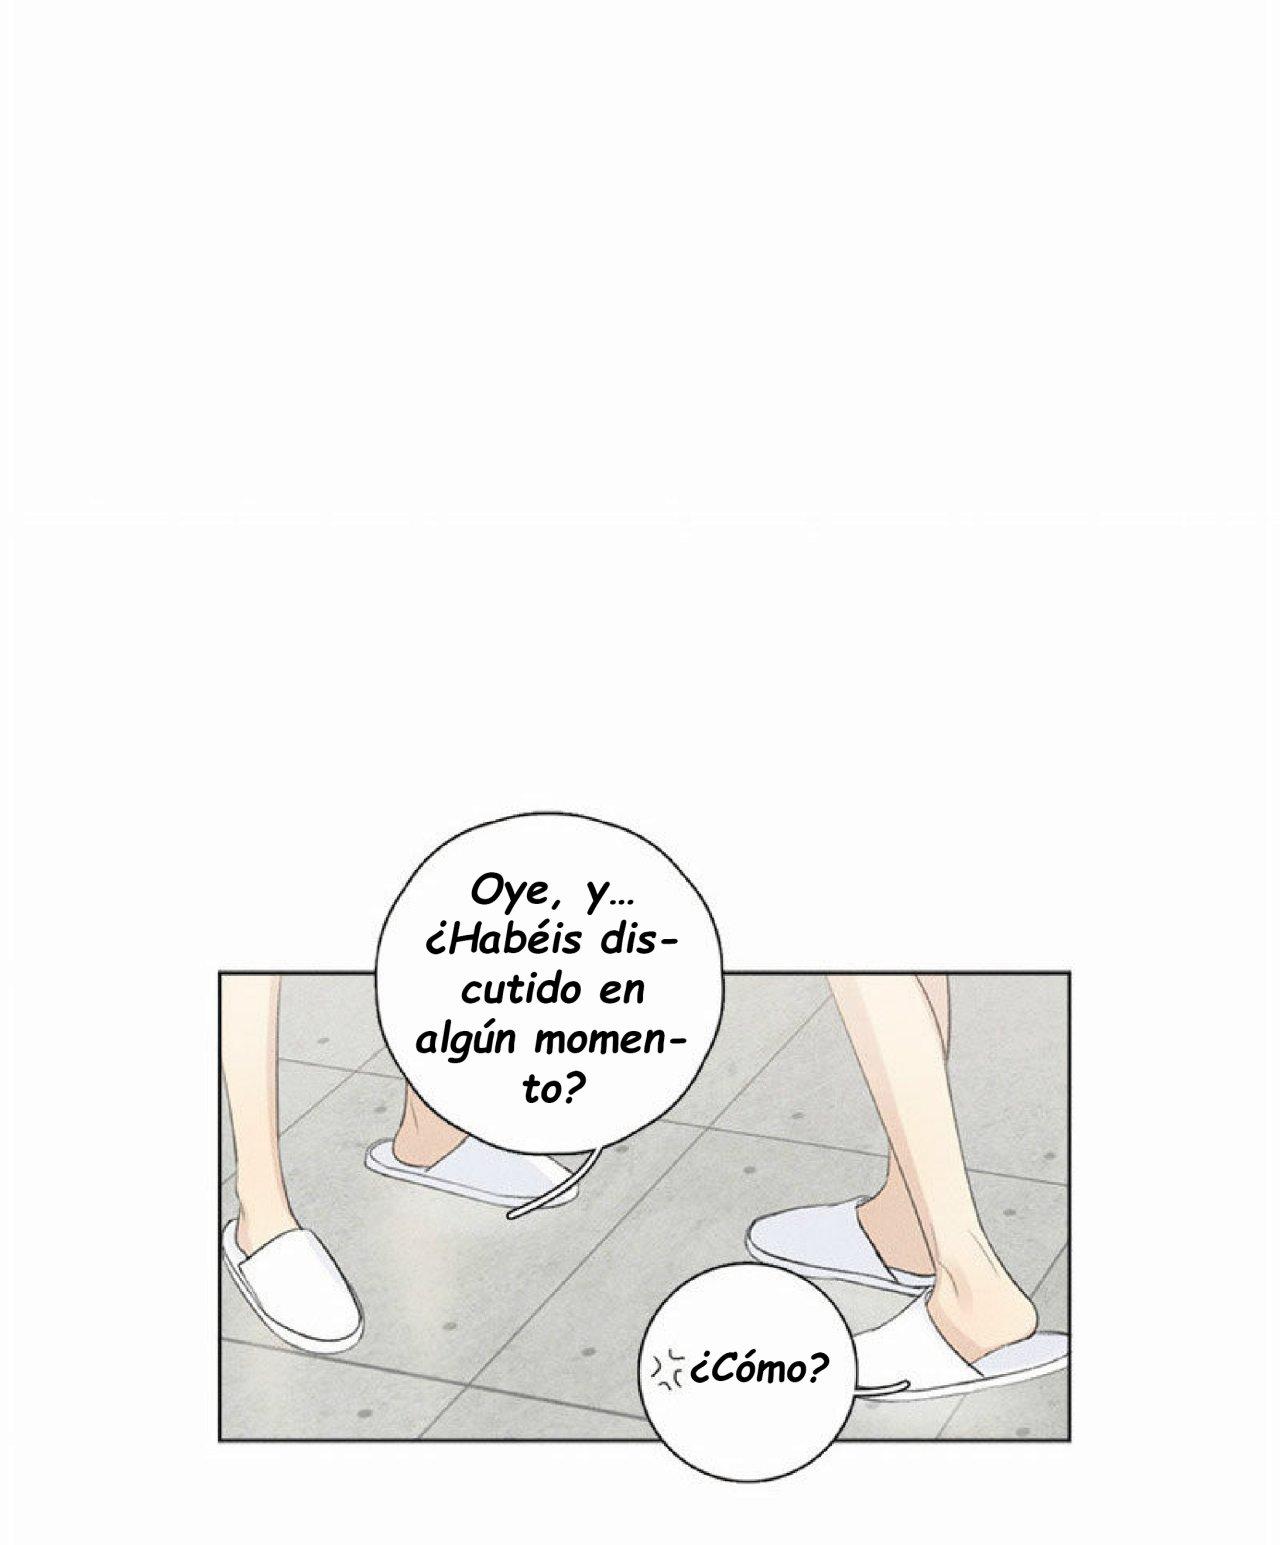 https://nine.mangadogs.com/es_manga/pic8/29/24925/946329/51cb8efc21e2f073d9261b4d059ed96d.jpg Page 32